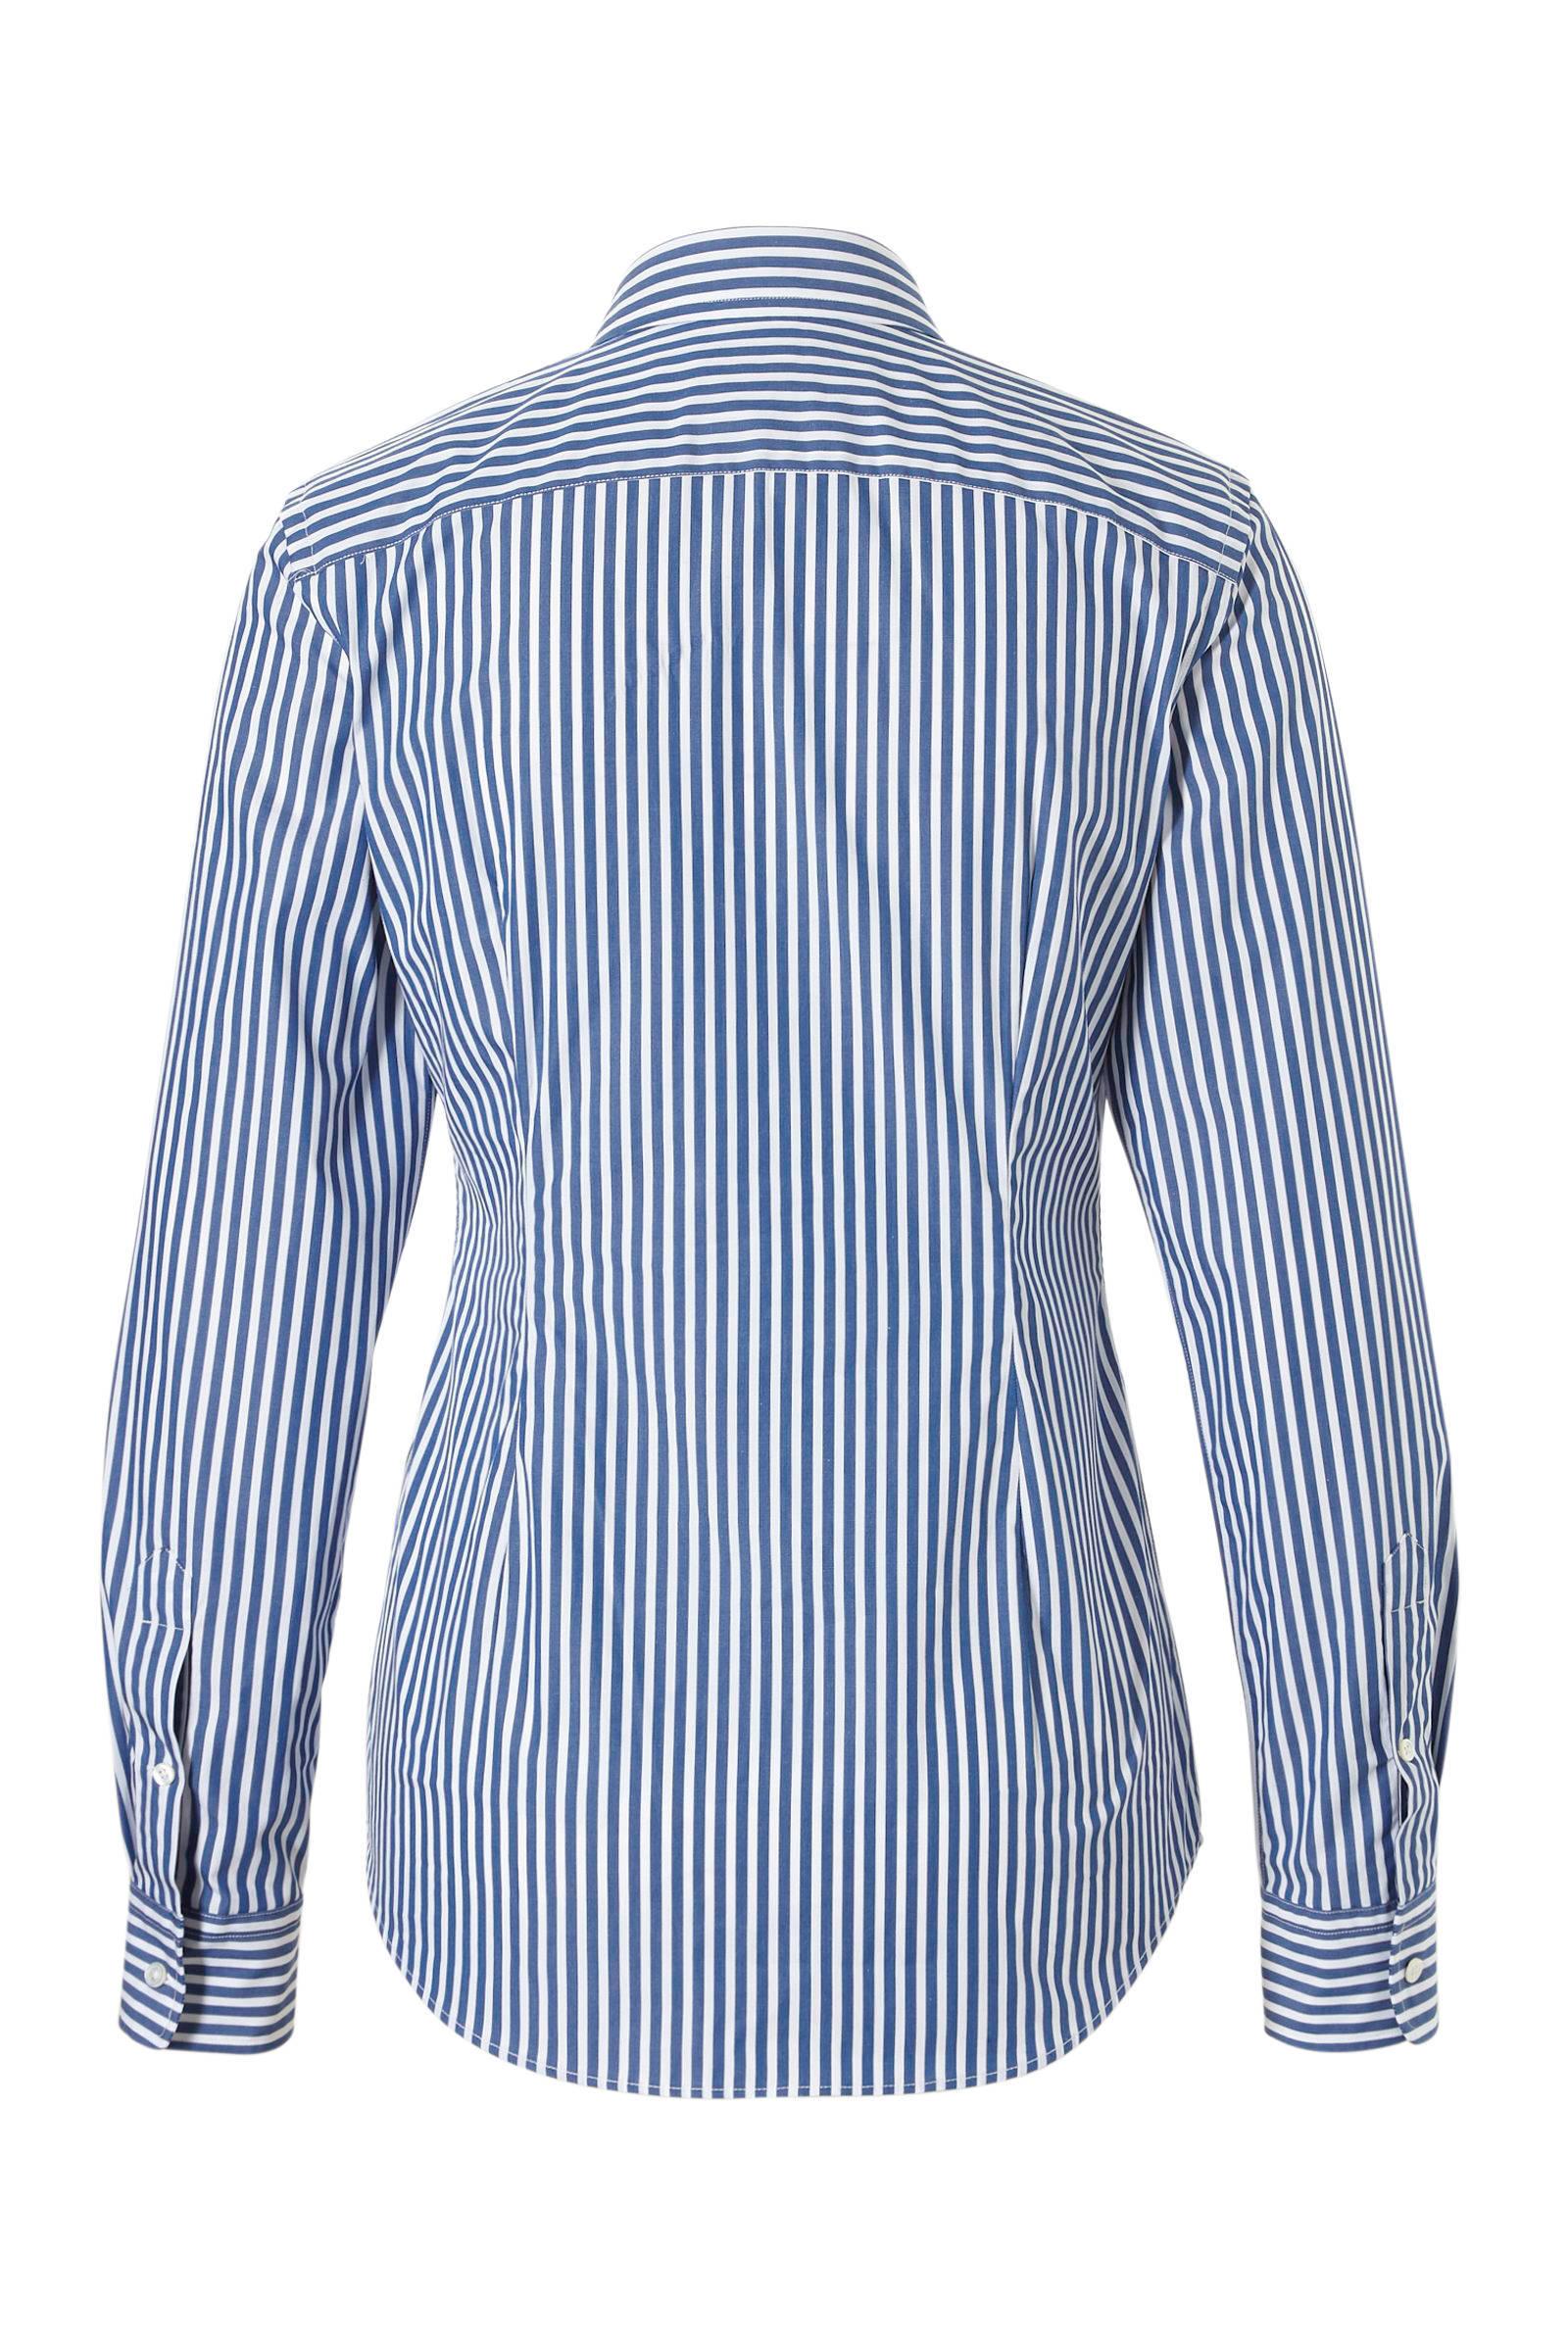 blouse Ralph streepte Lauren blauw POLO 1wqHzY1